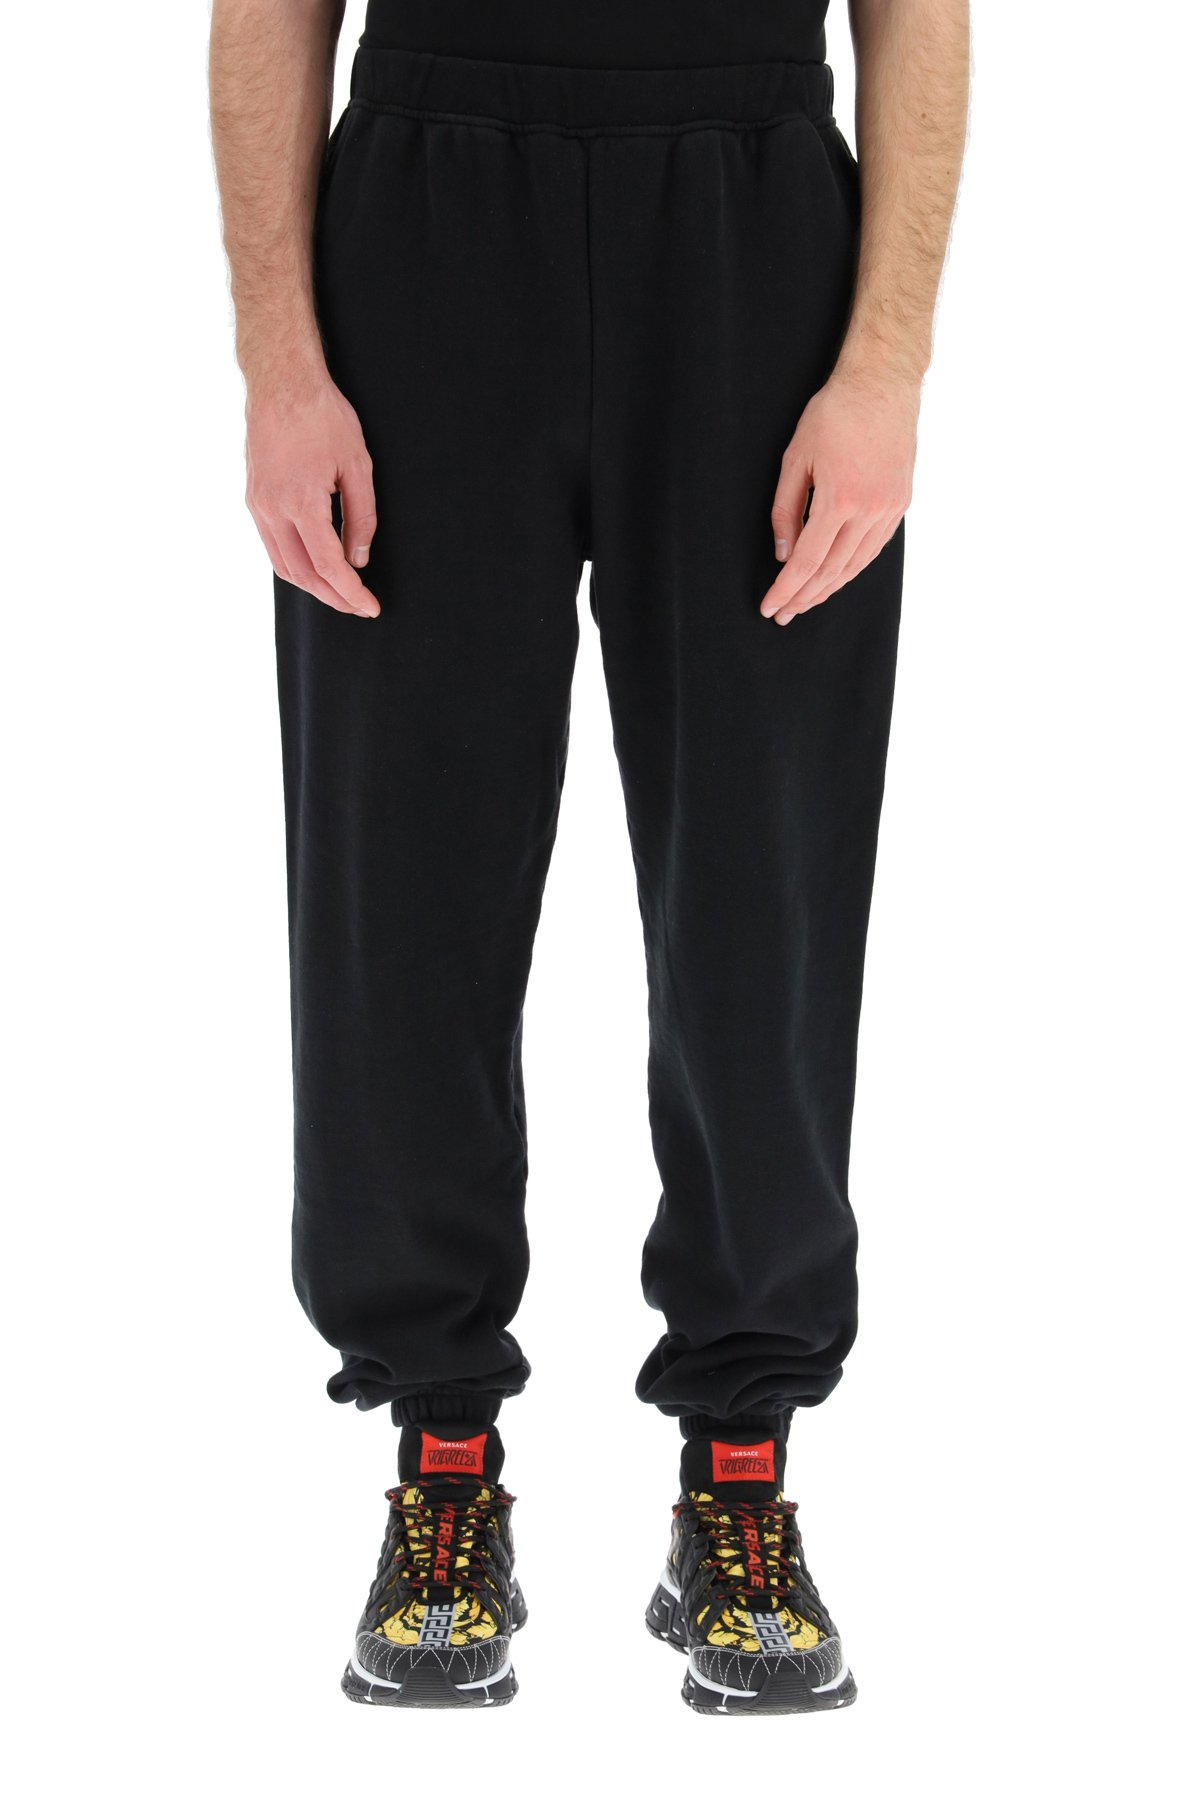 Aries pantaloni jogger stampa temple